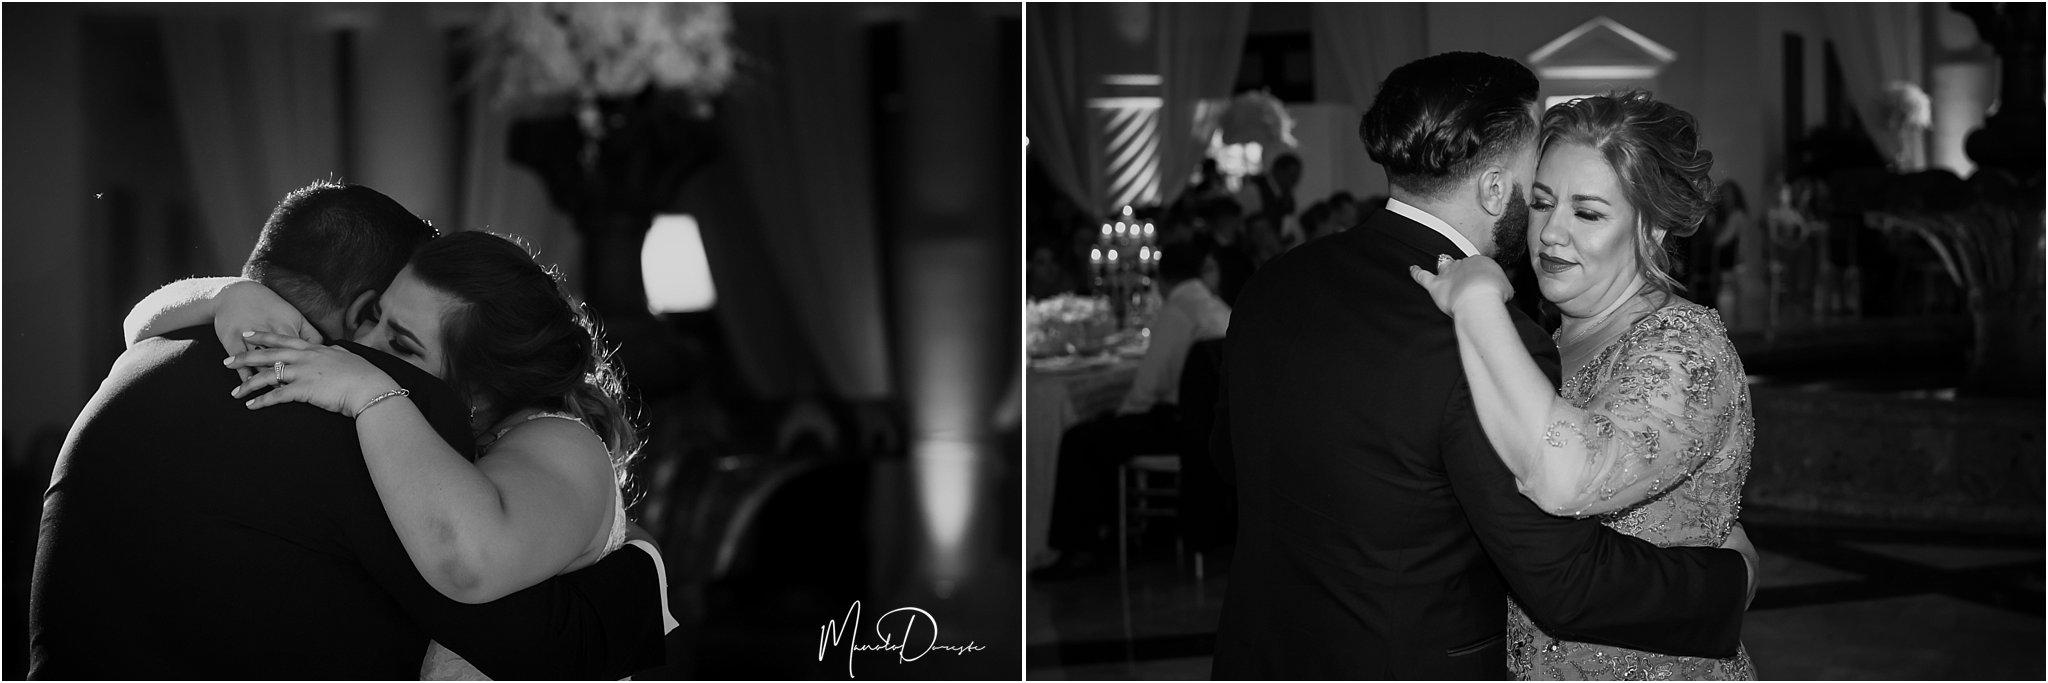 0375_ManoloDoreste_InFocusStudios_Wedding_Family_Photography_Miami_MiamiPhotographer.jpg